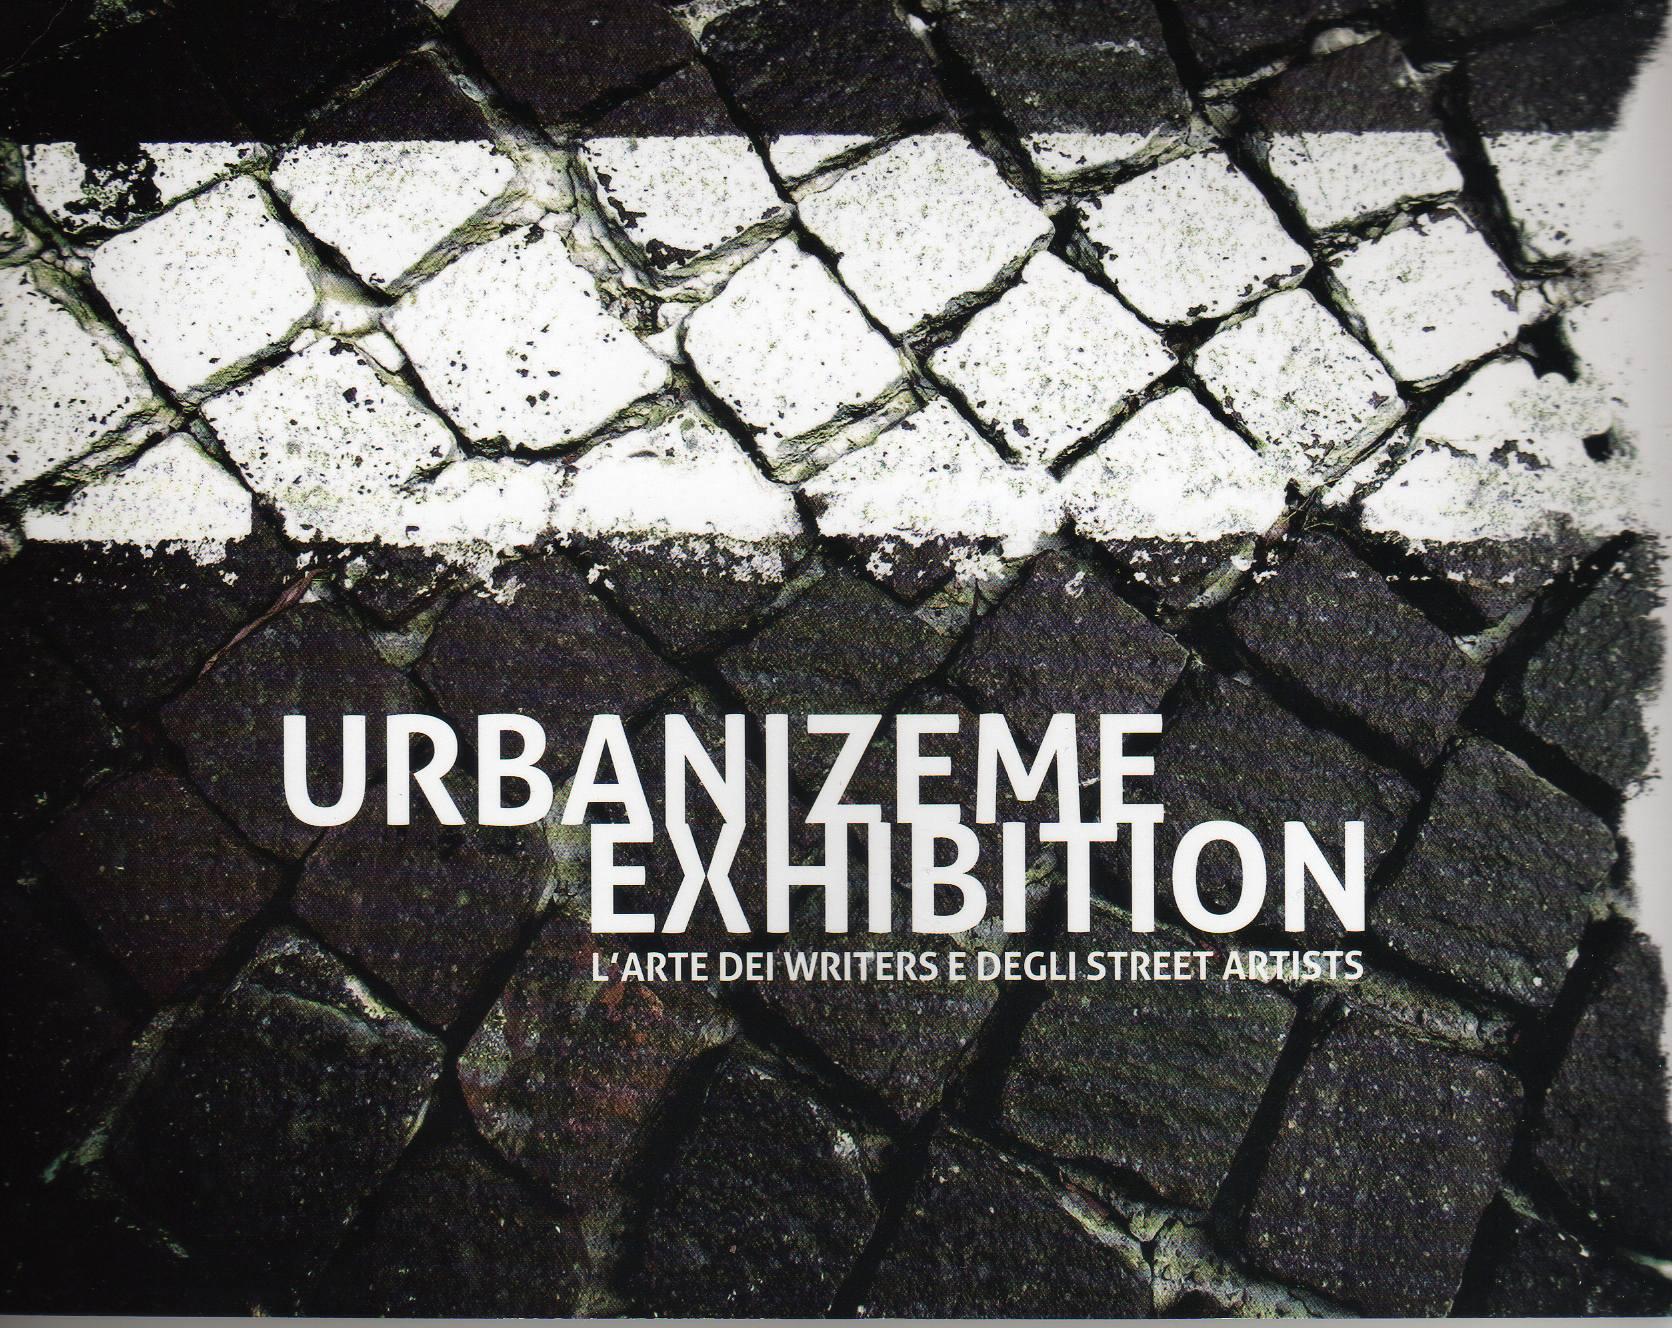 Urbanizeme Exhibition